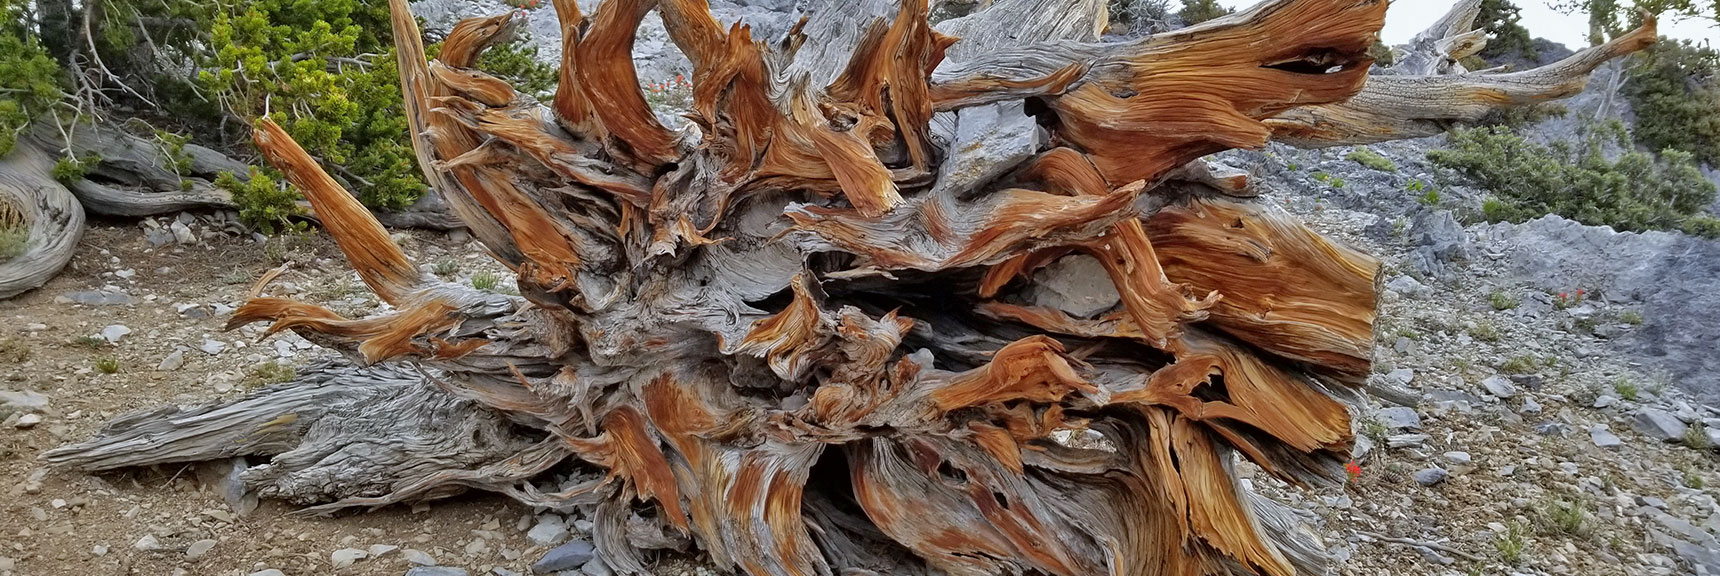 Fallen Bristlecone Pine on a North Loop Trail Plateau   Mummy Mountain Nevada Northeast Approach